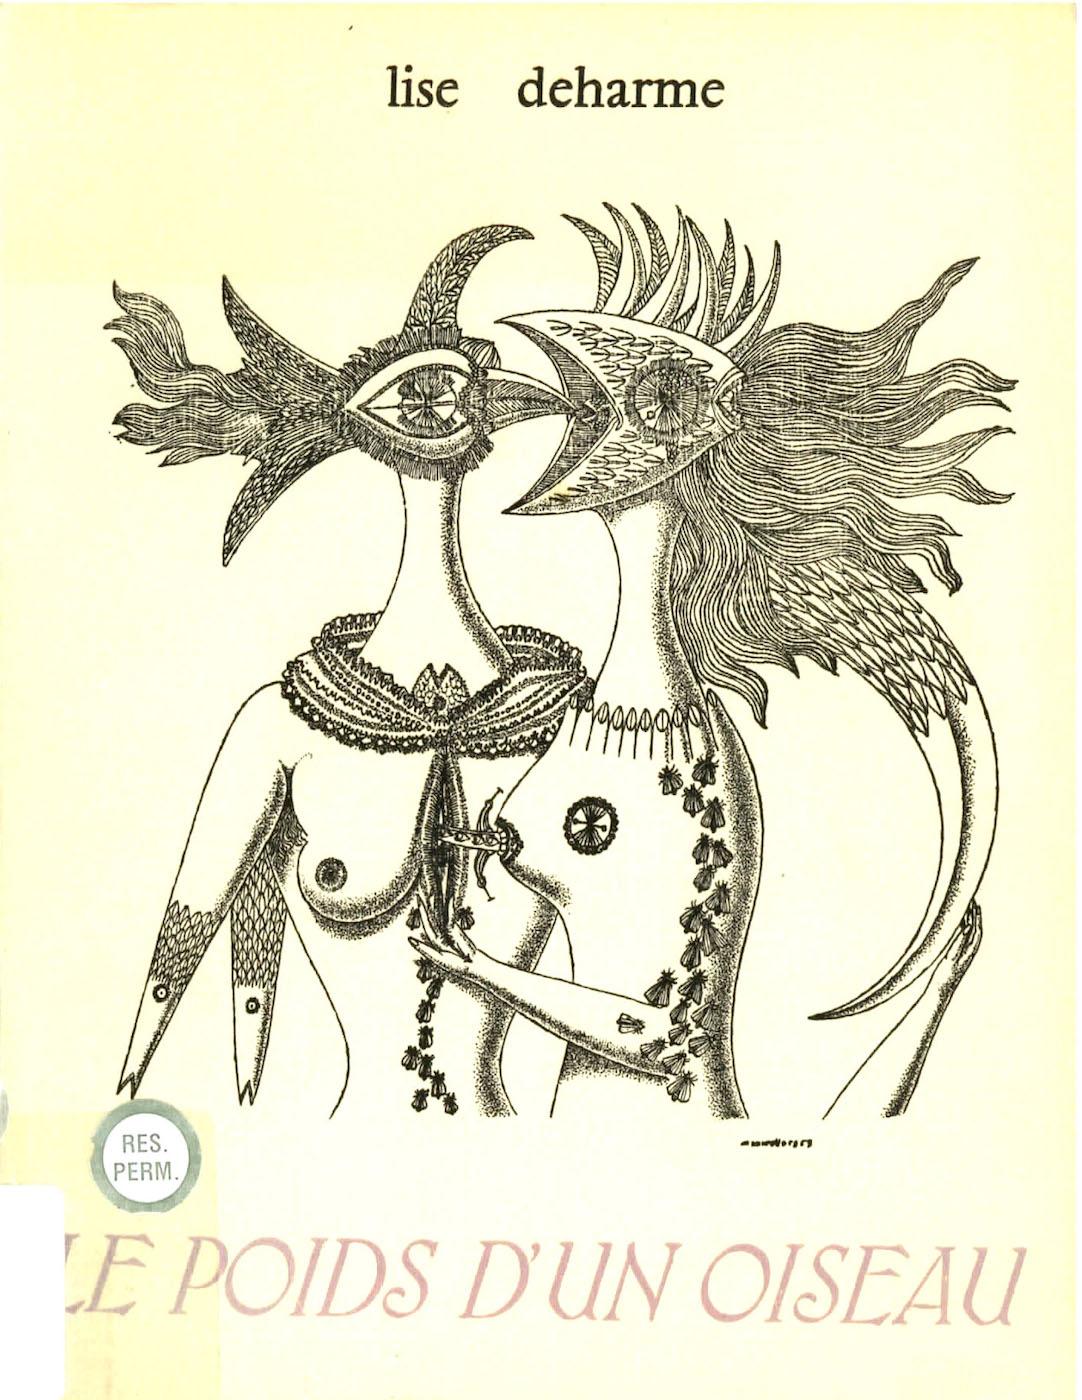 Lise Deharme, <br /><em>LePoids d'unoiseau</em>, 1955